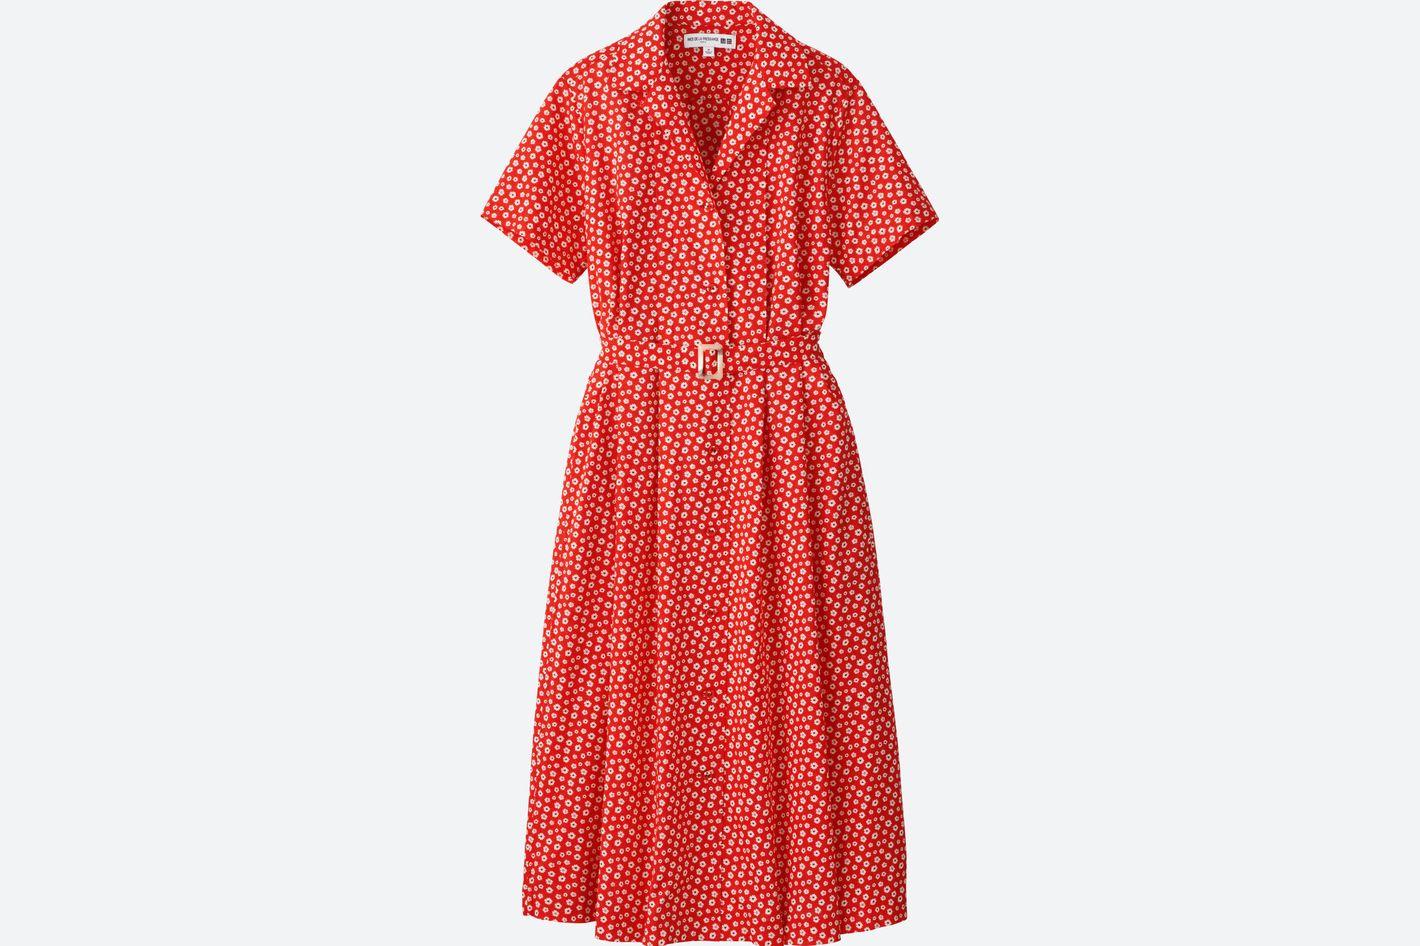 Women Cotton Lawn Tuck Short-Sleeve Dress